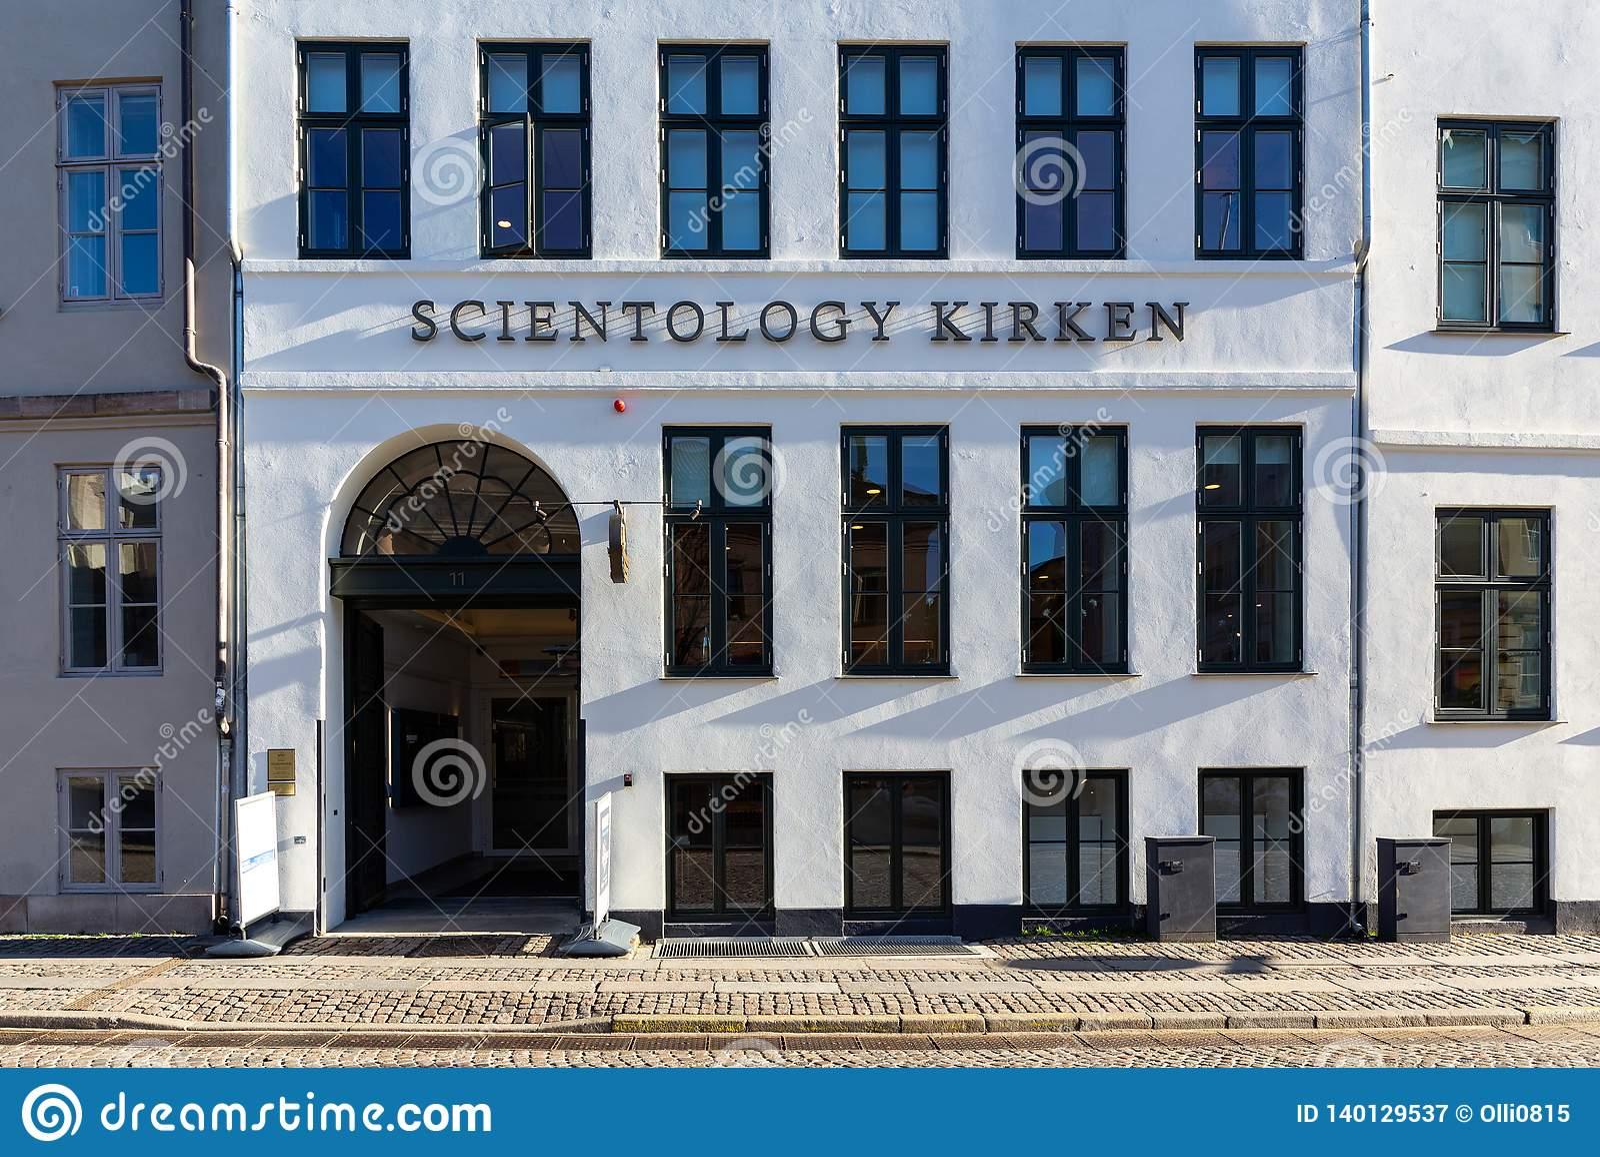 Kirchen Scientology